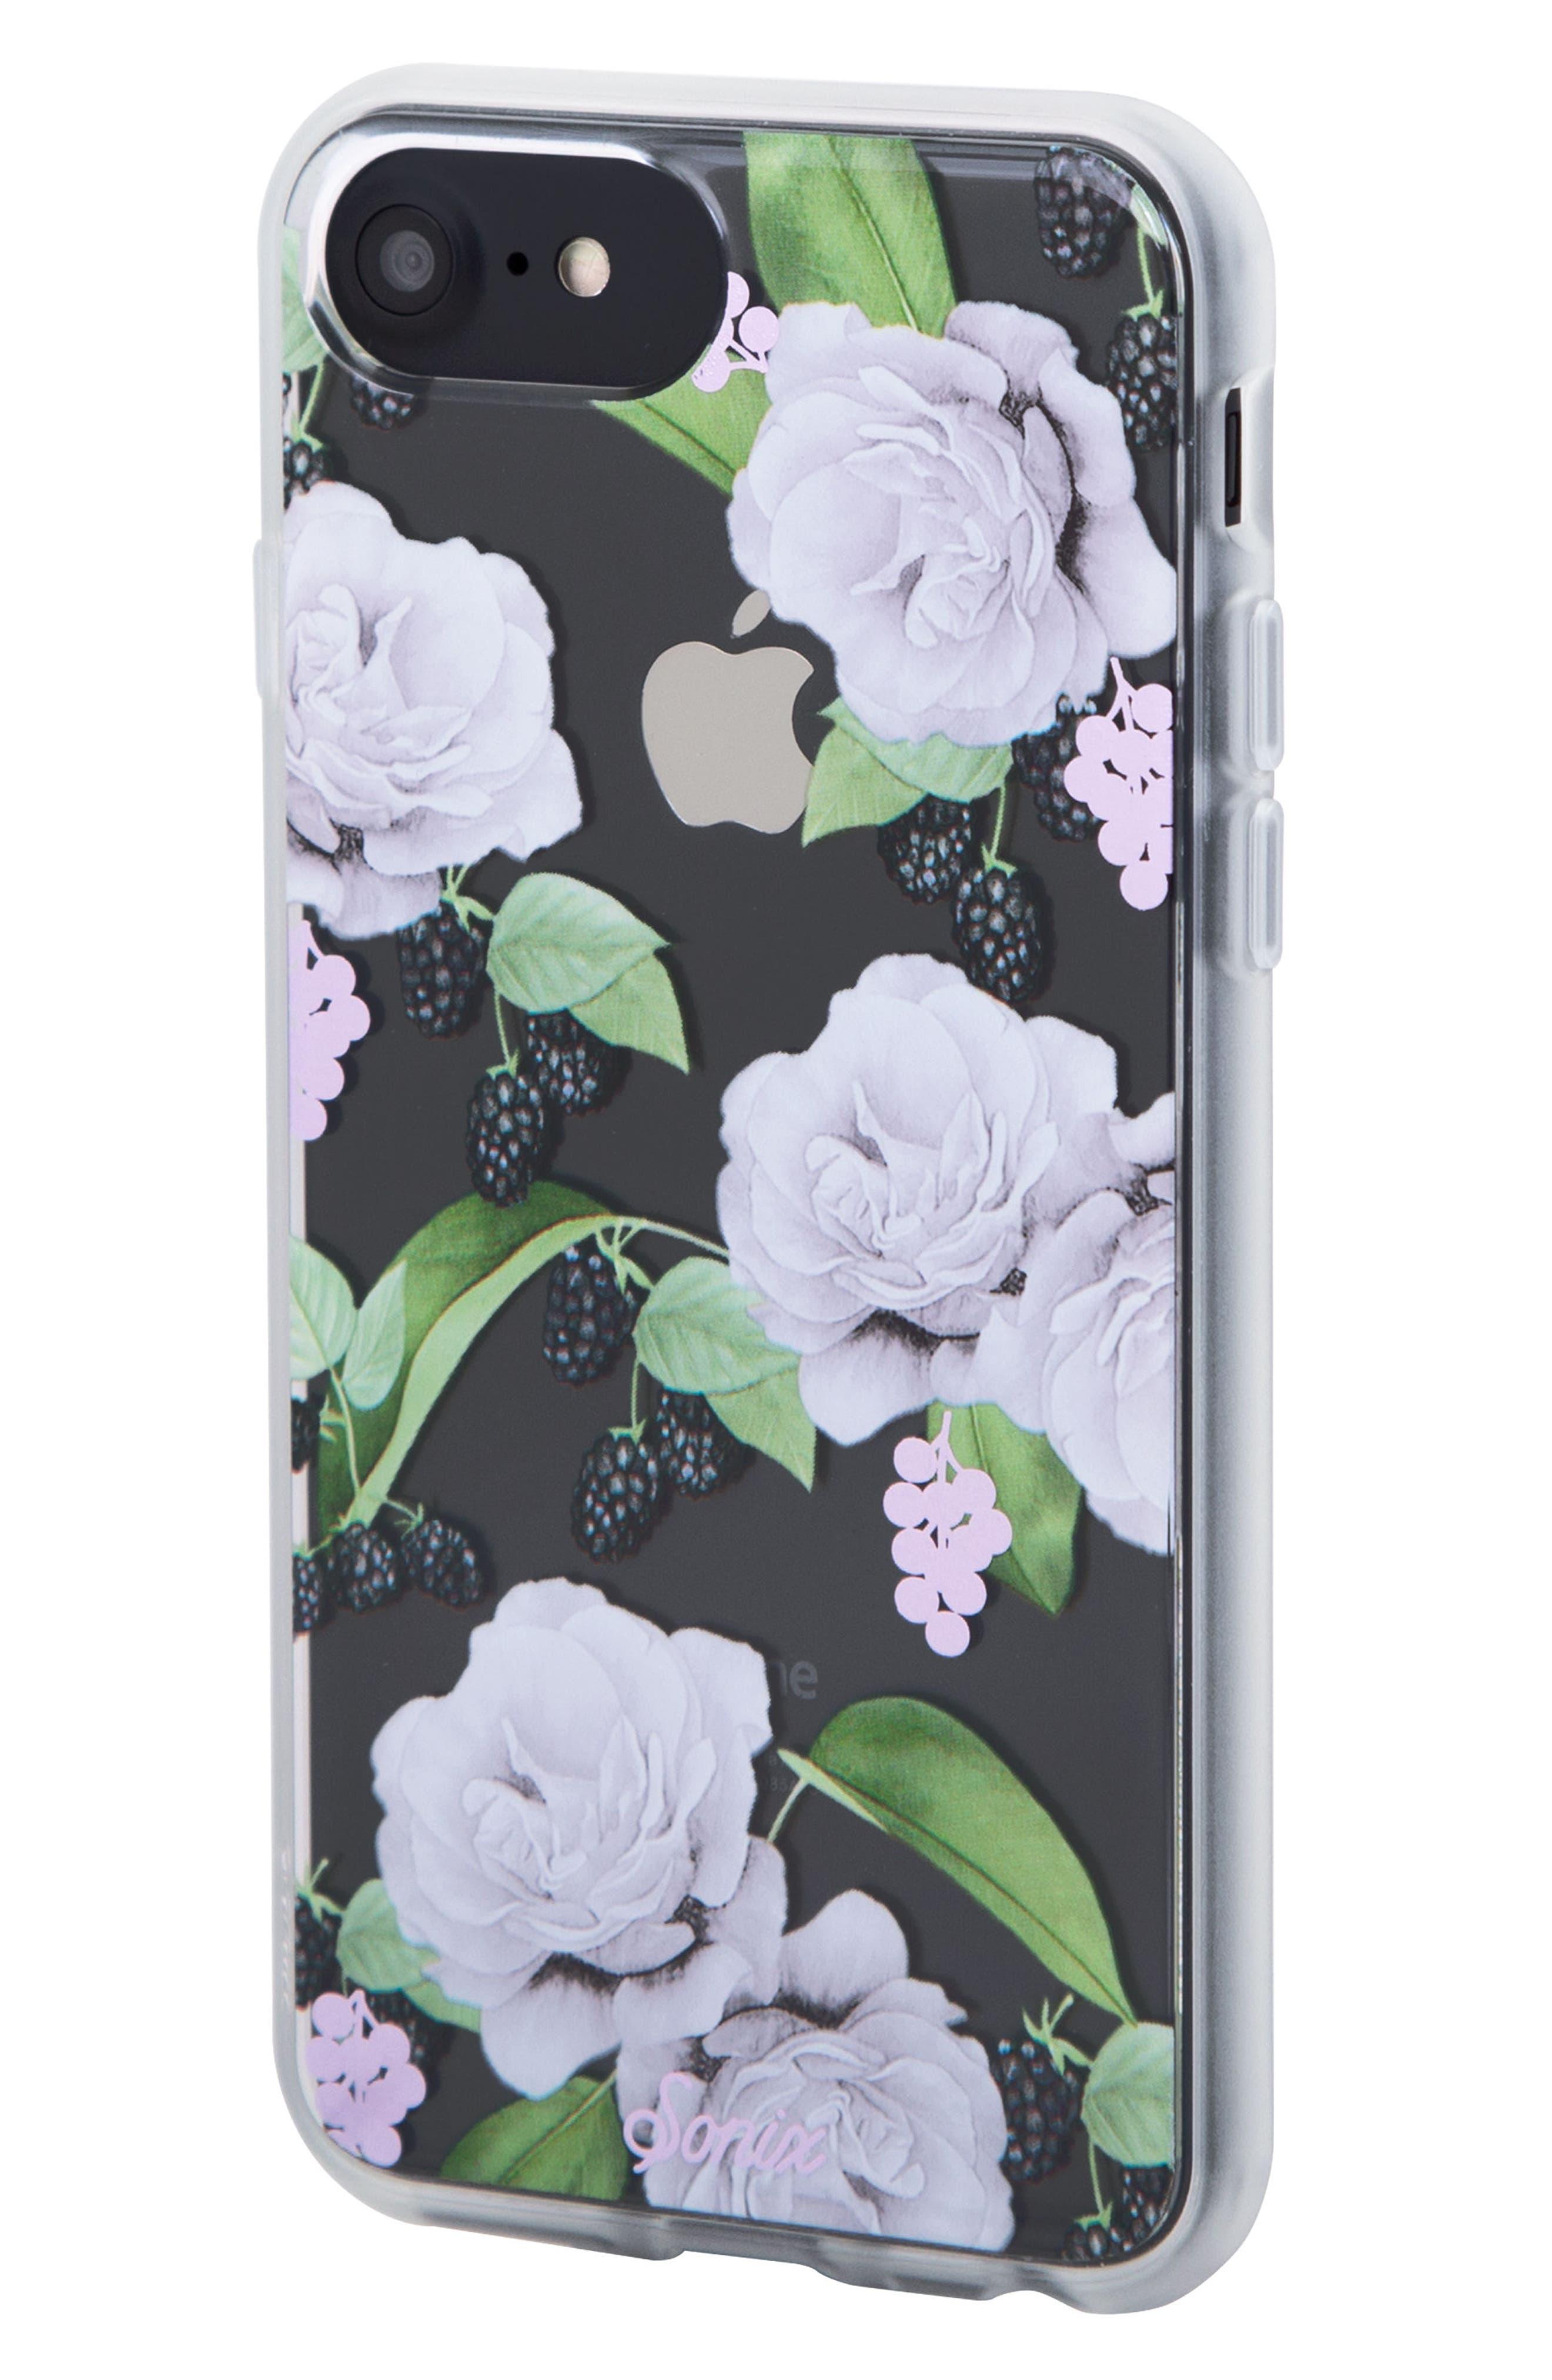 Floral Berry iPhone 6/6s/7/8 & 6/6s/7/8 Plus Case,                             Alternate thumbnail 2, color,                             WHITE/ LILAC